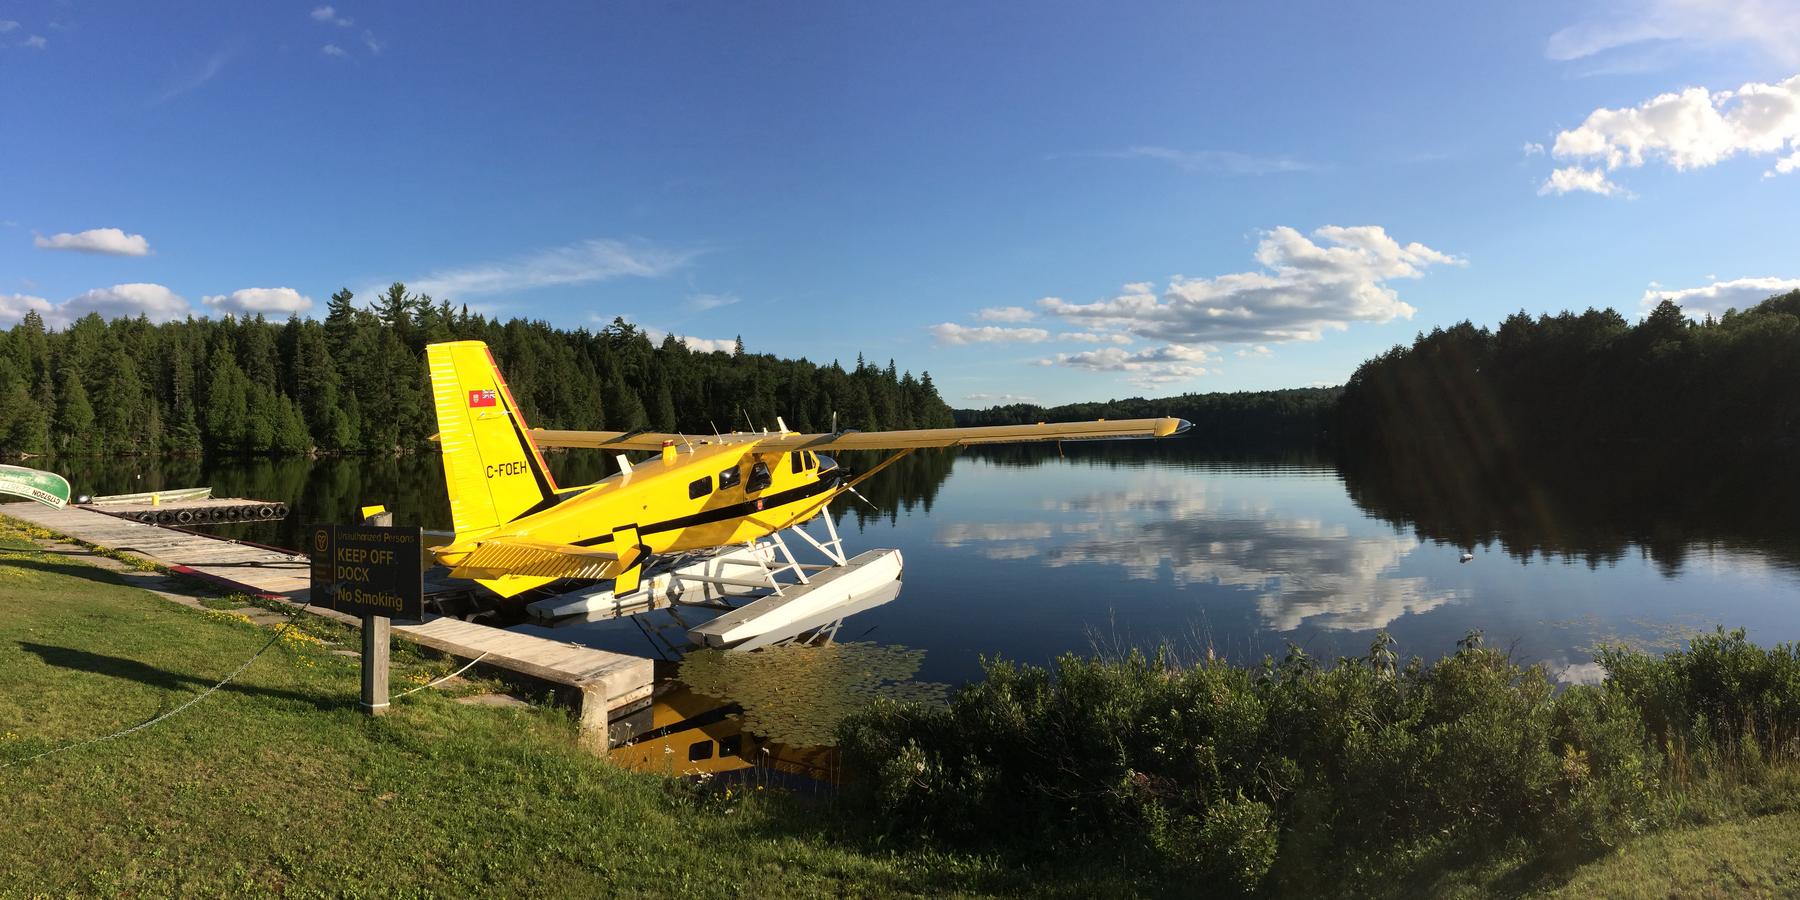 Watervliegtuig Algonquin Provincial Park - Ontario - Canada - Doets Reizen